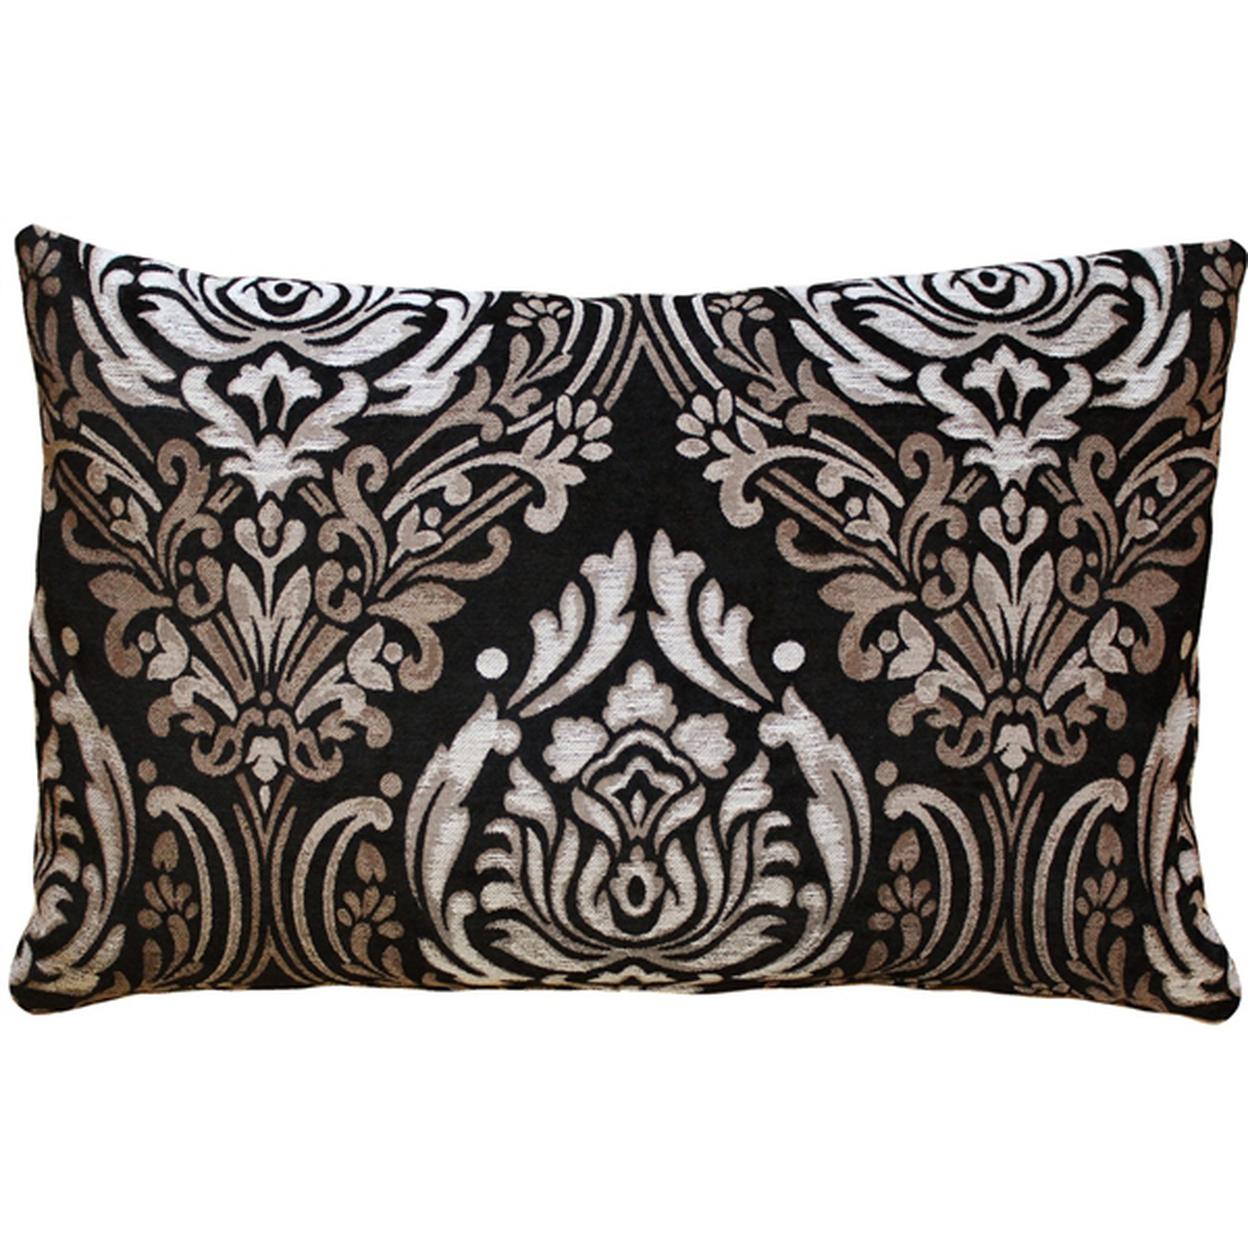 Pillow Decor - Palazzo Black 16x24 Throw Pillow 55b6d09da2771c5c5d8b48fe